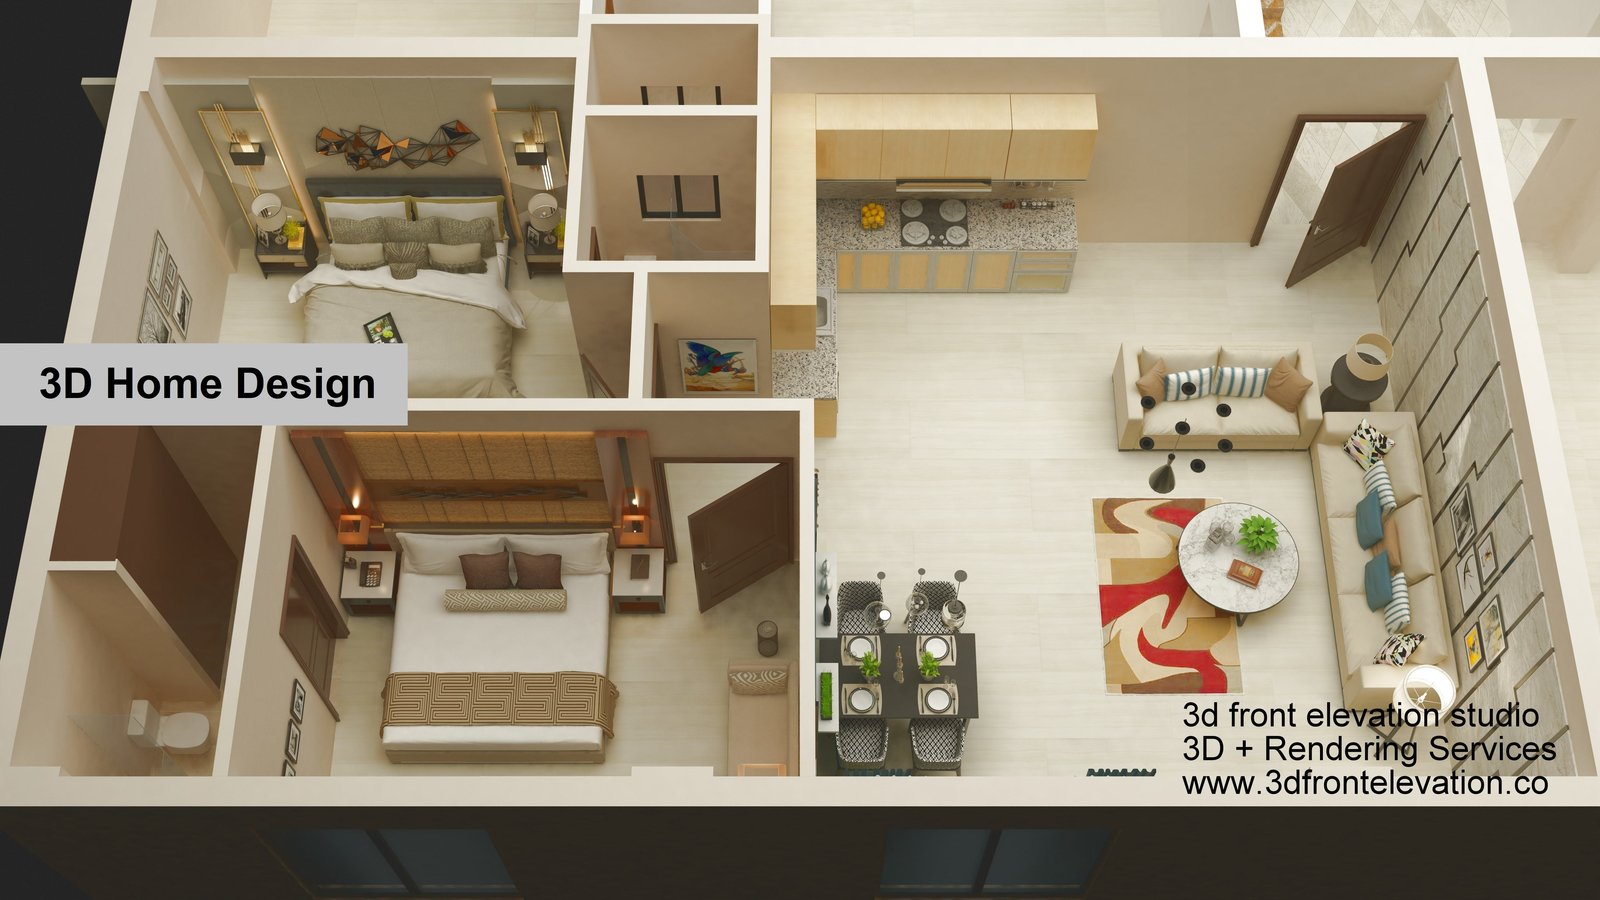 3D Home Design + Rendering Services  3D Interior Rendering